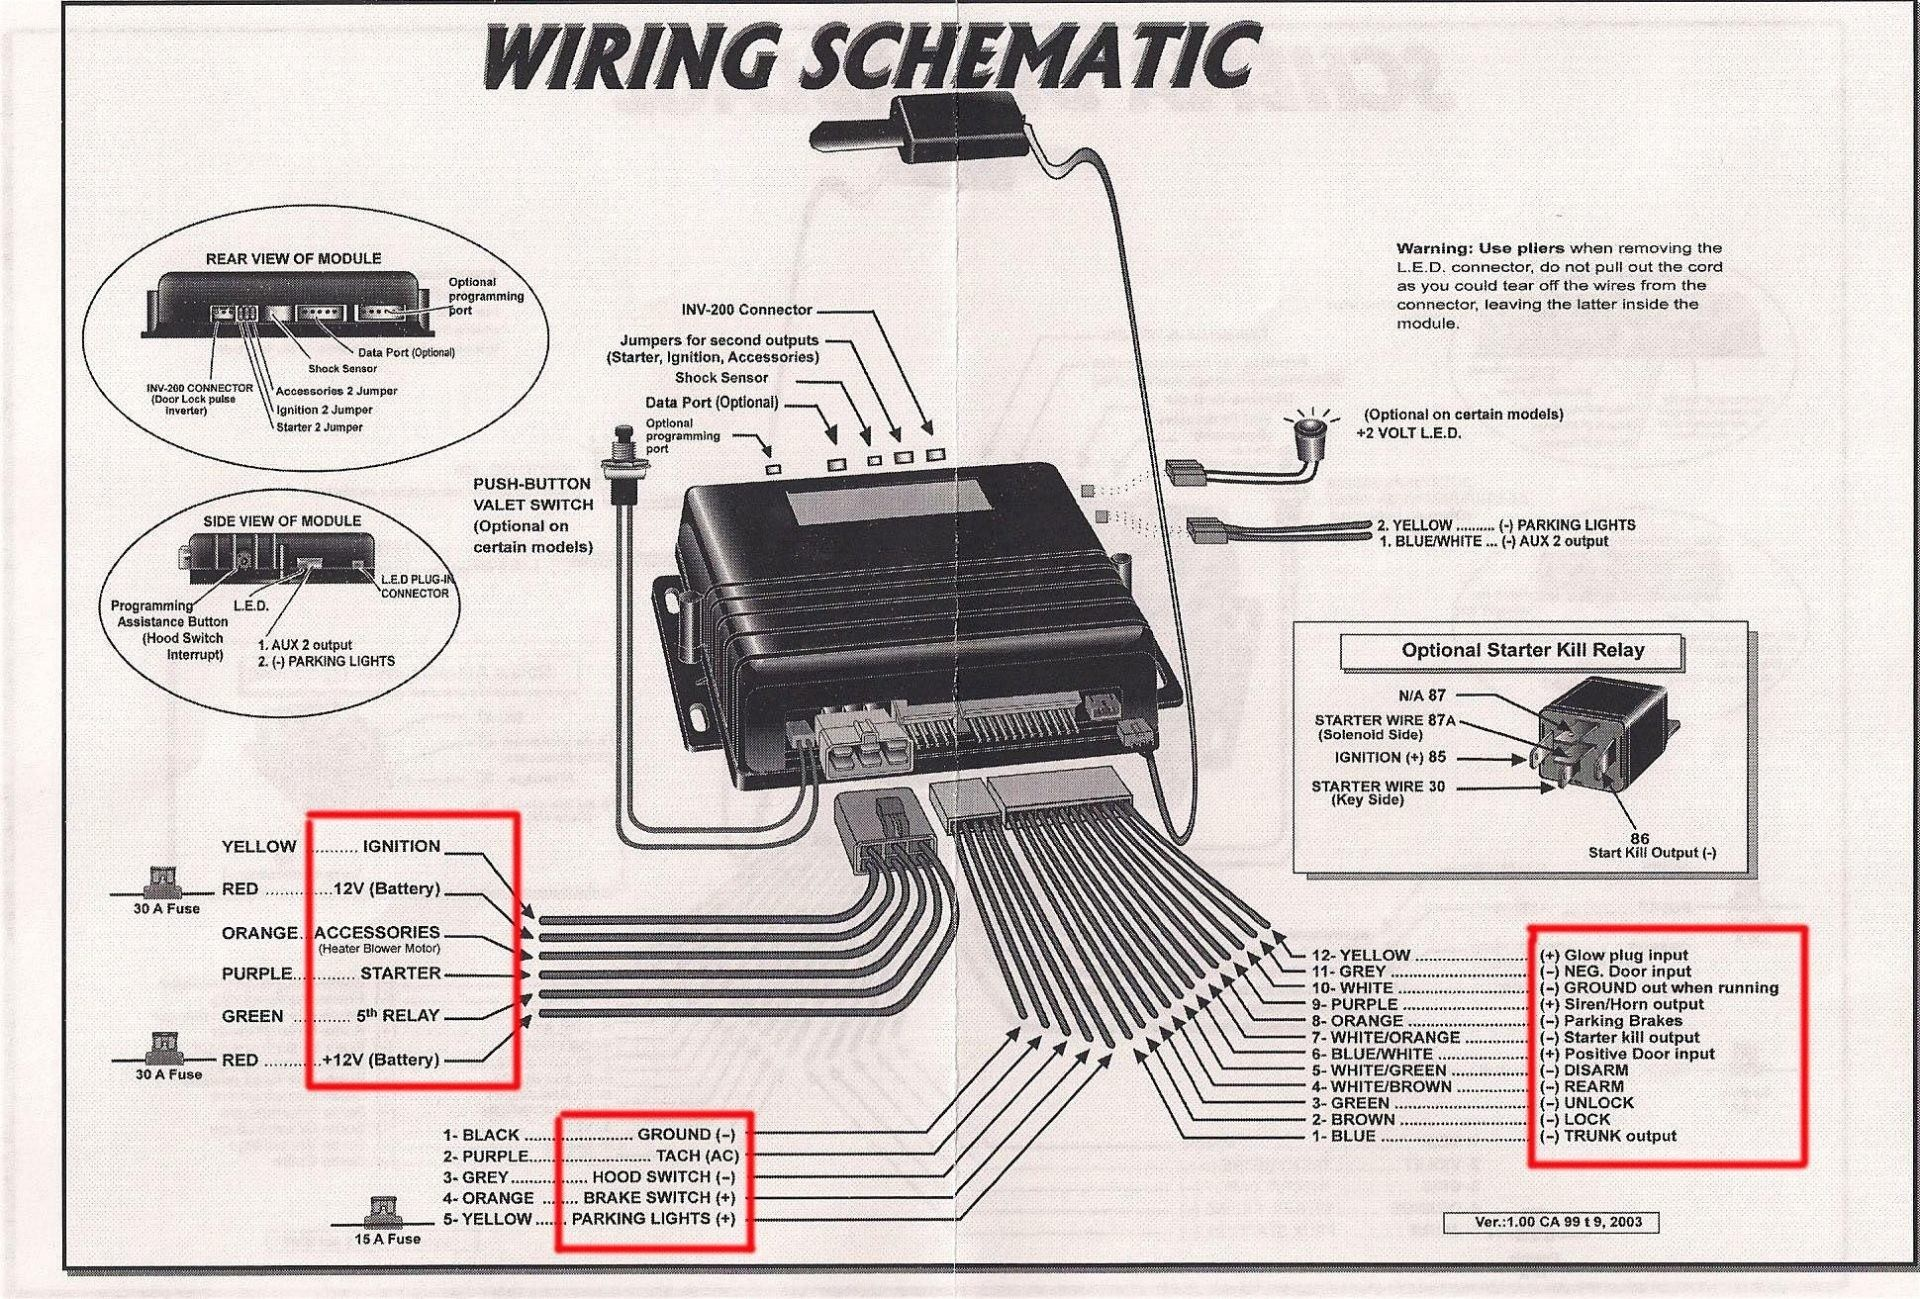 Wiring Diagram For Car Alarm : Viper alarm system wiring diagram million